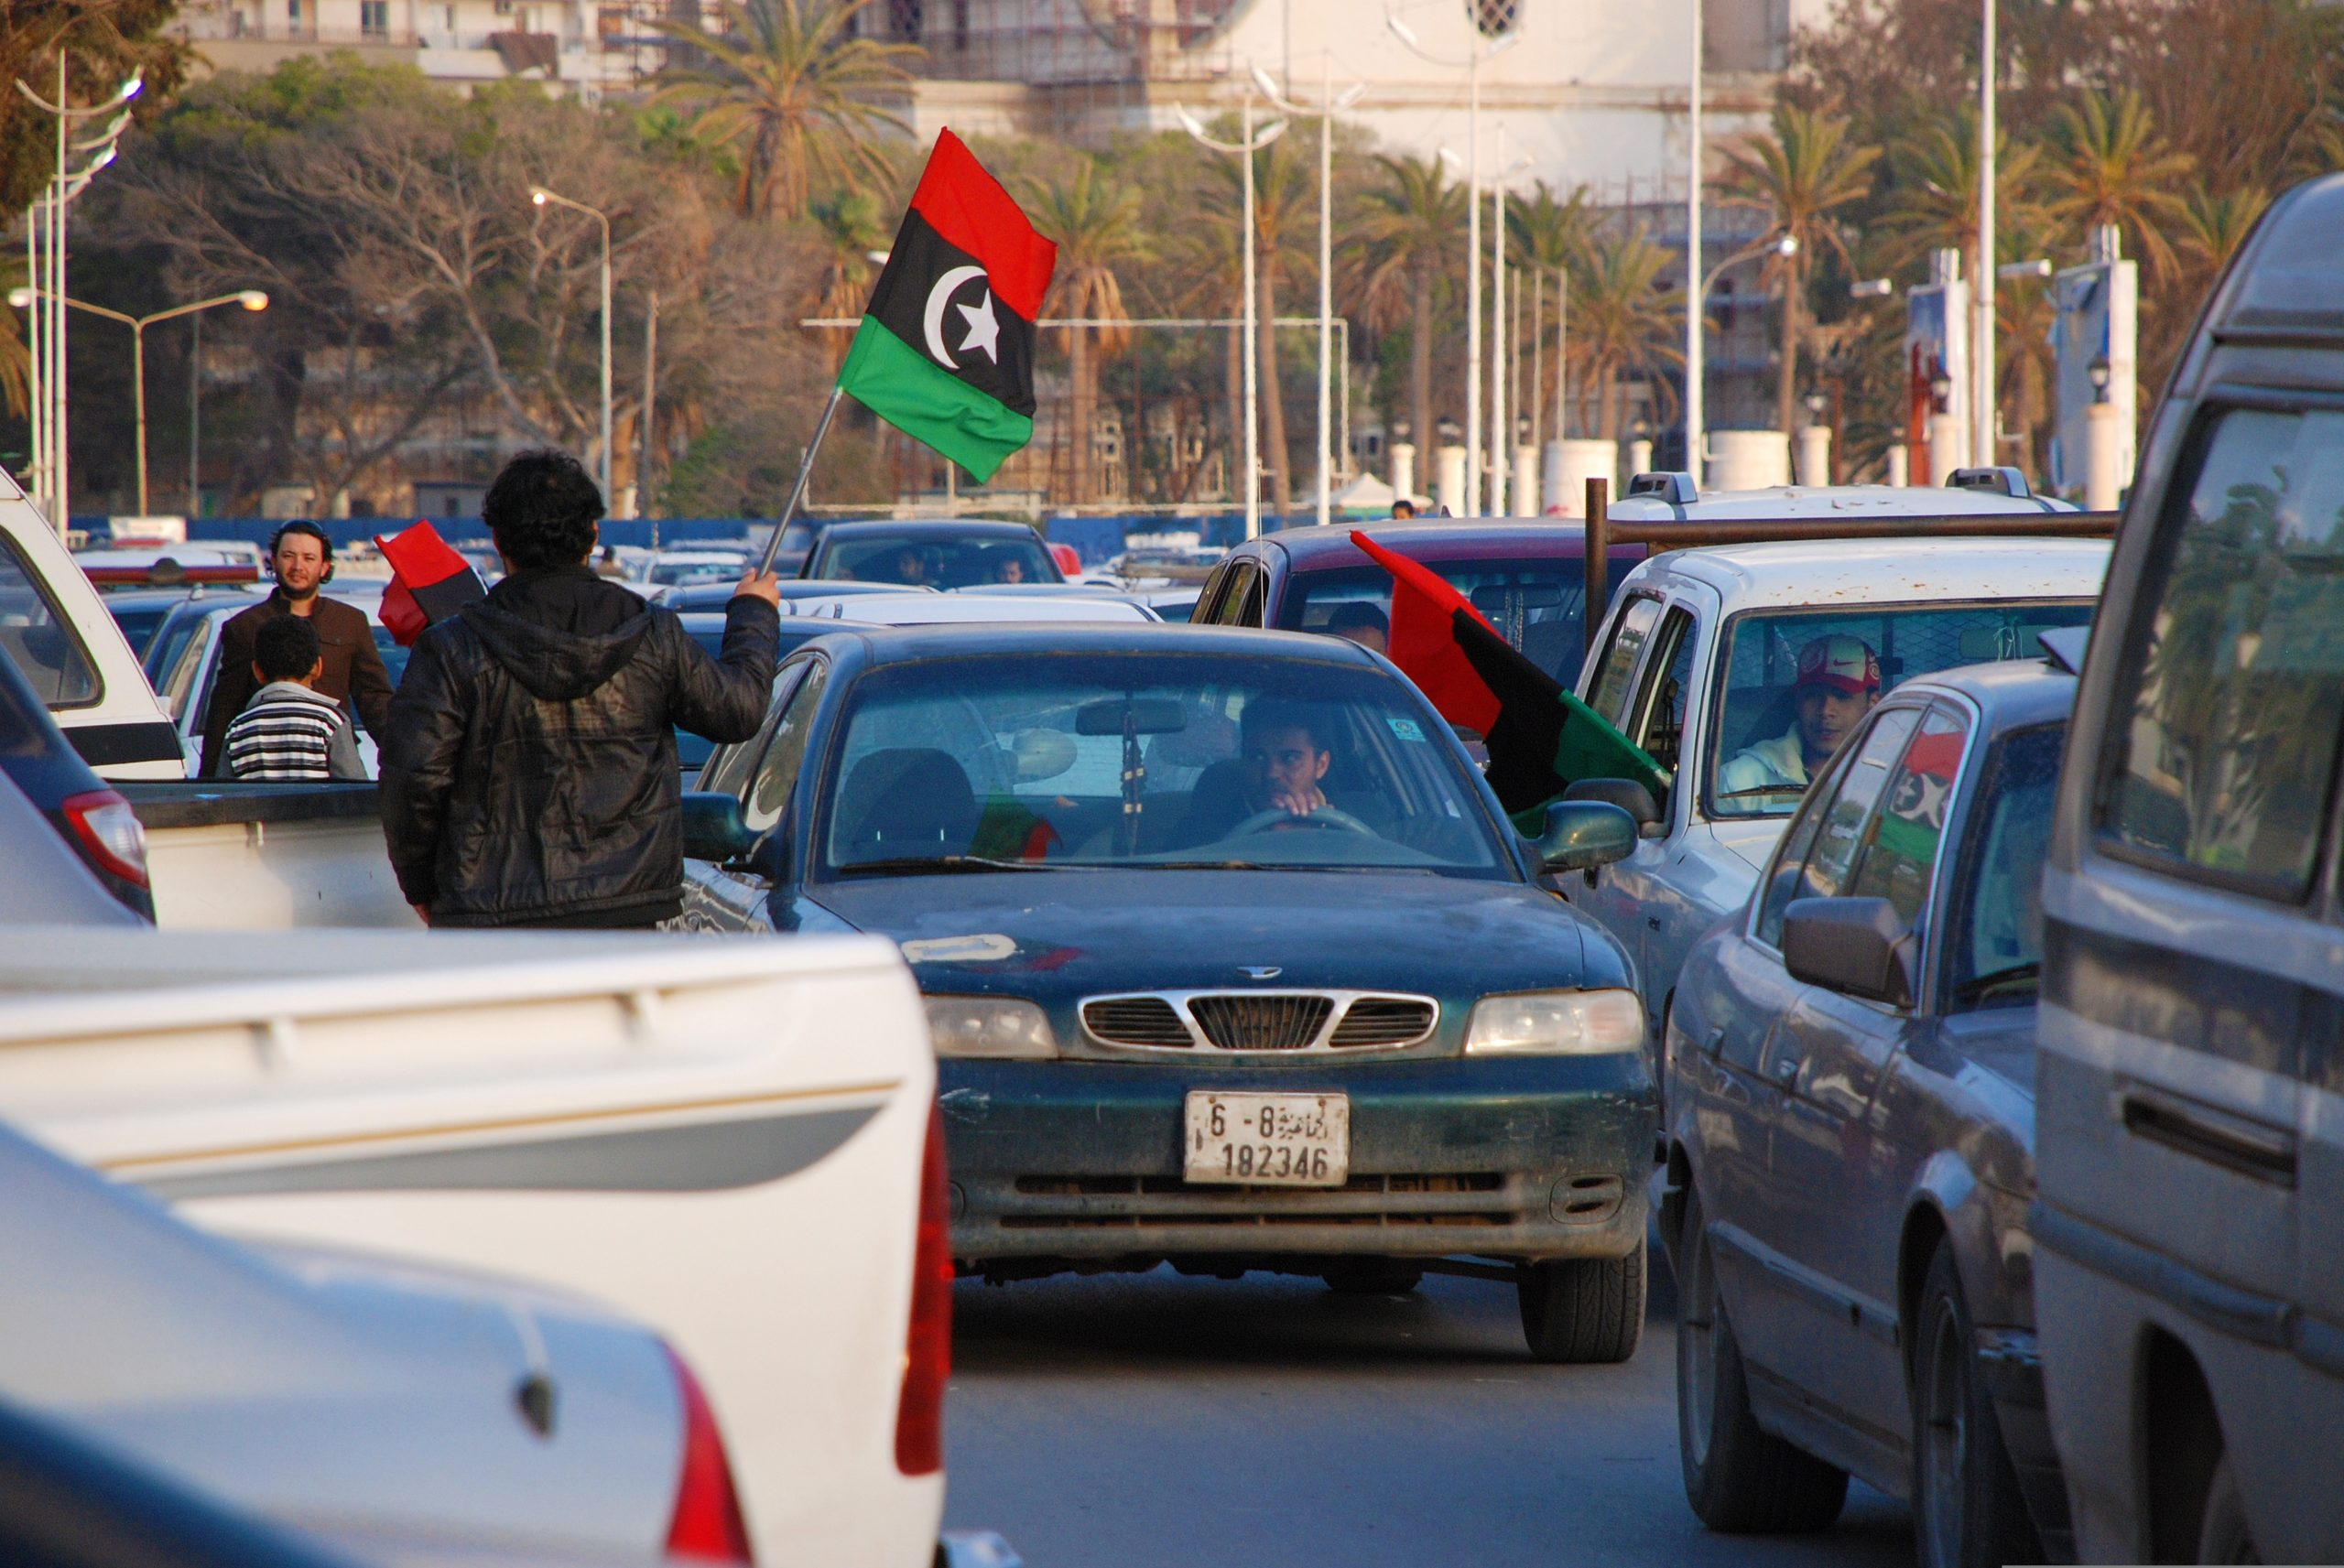 Dissident: Gaddafi-tale er tom snak